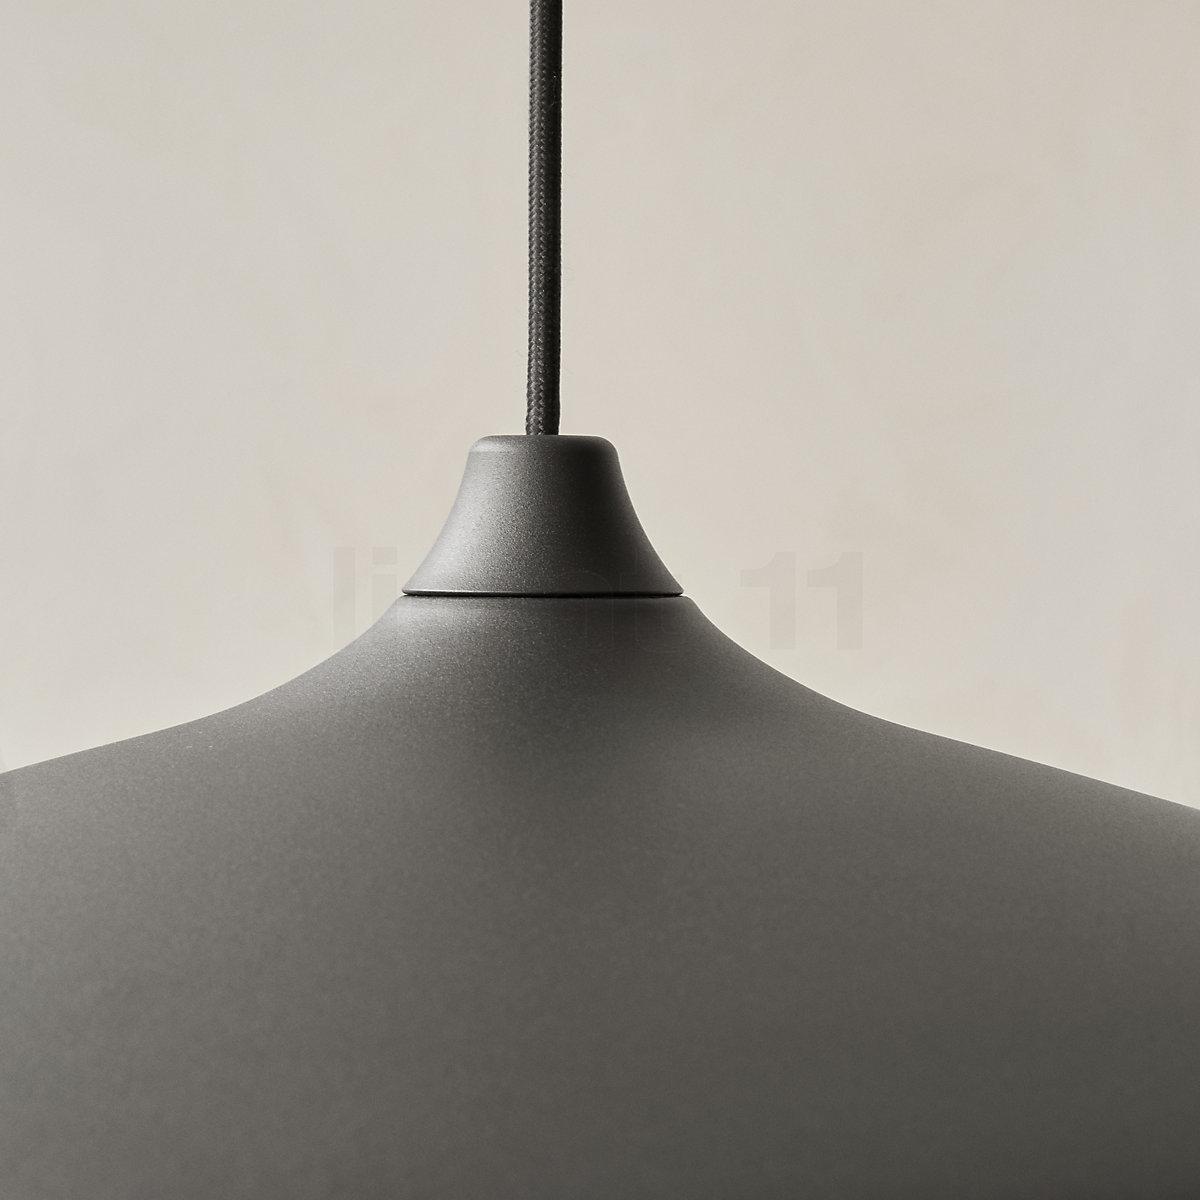 Buy Menu Circular Lamp Pendant Light Led At Light11 Eu